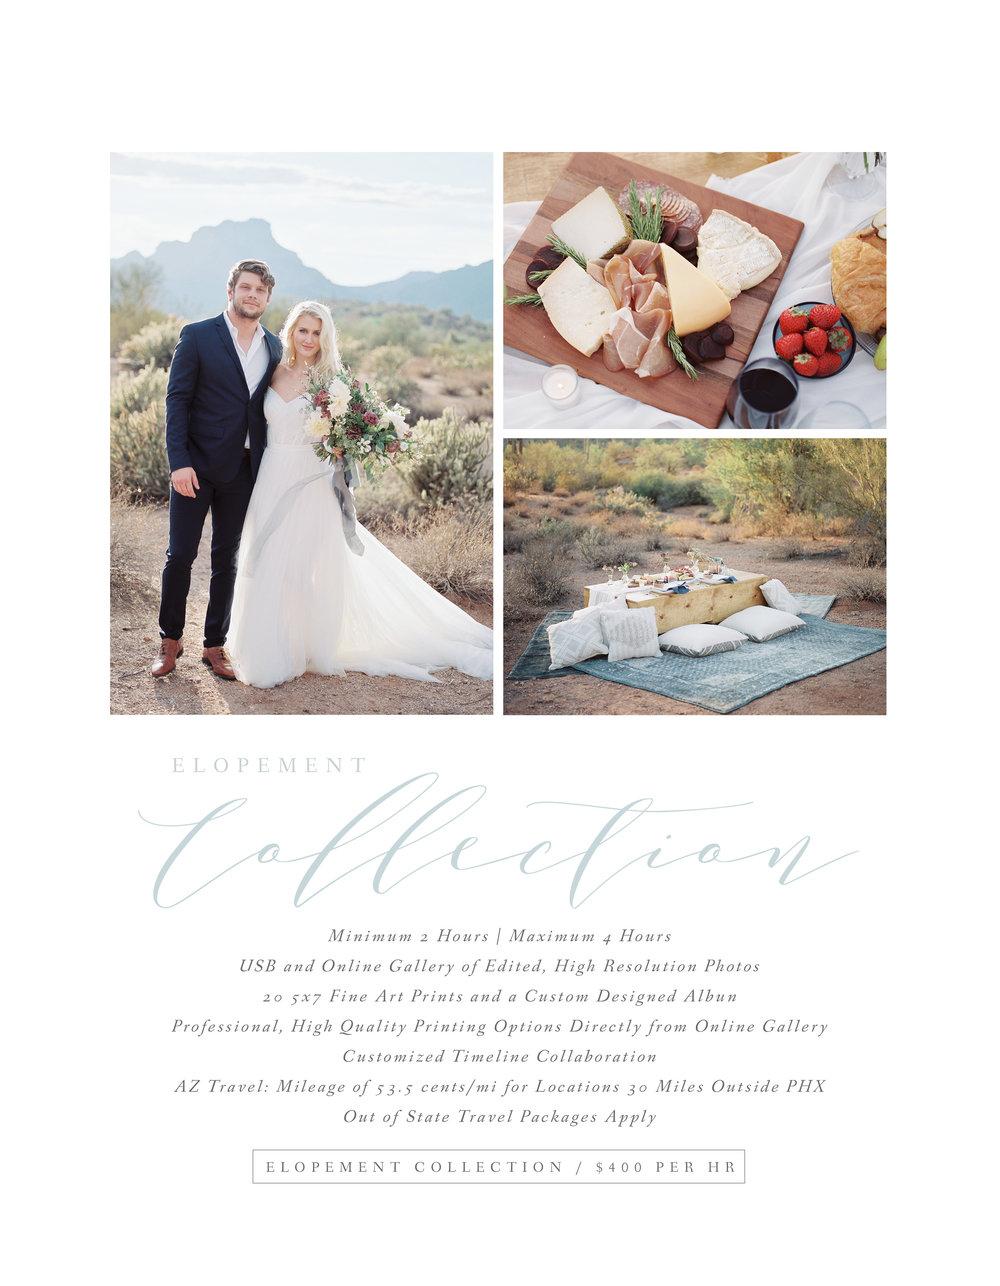 6Sarah Jane Photography Wedding Pricing 2017-2018.jpg